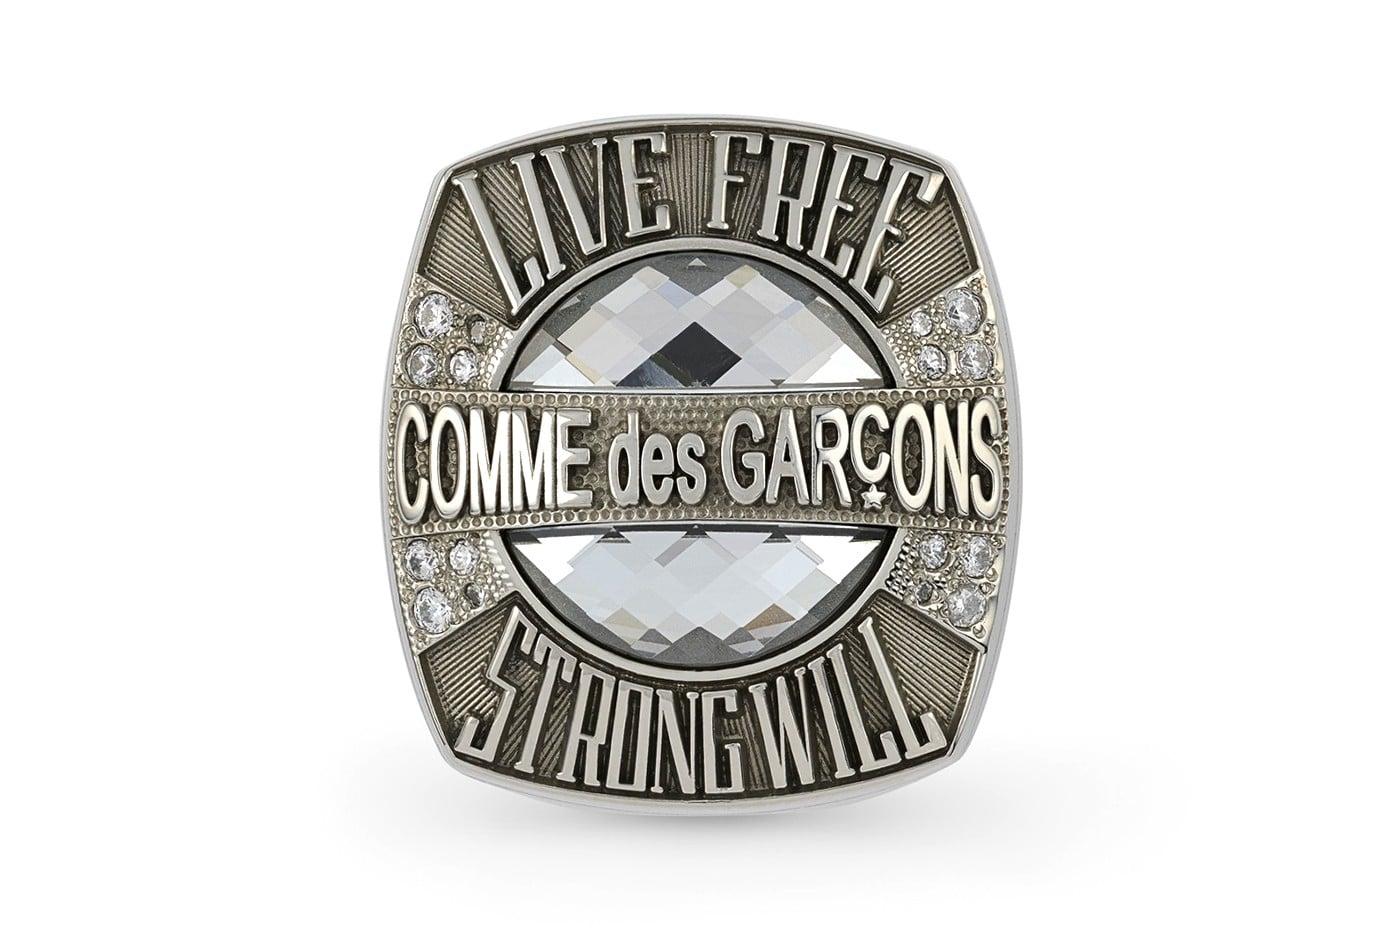 COMME des GARÇONS brings back its championship rings | HIGHXTAR.